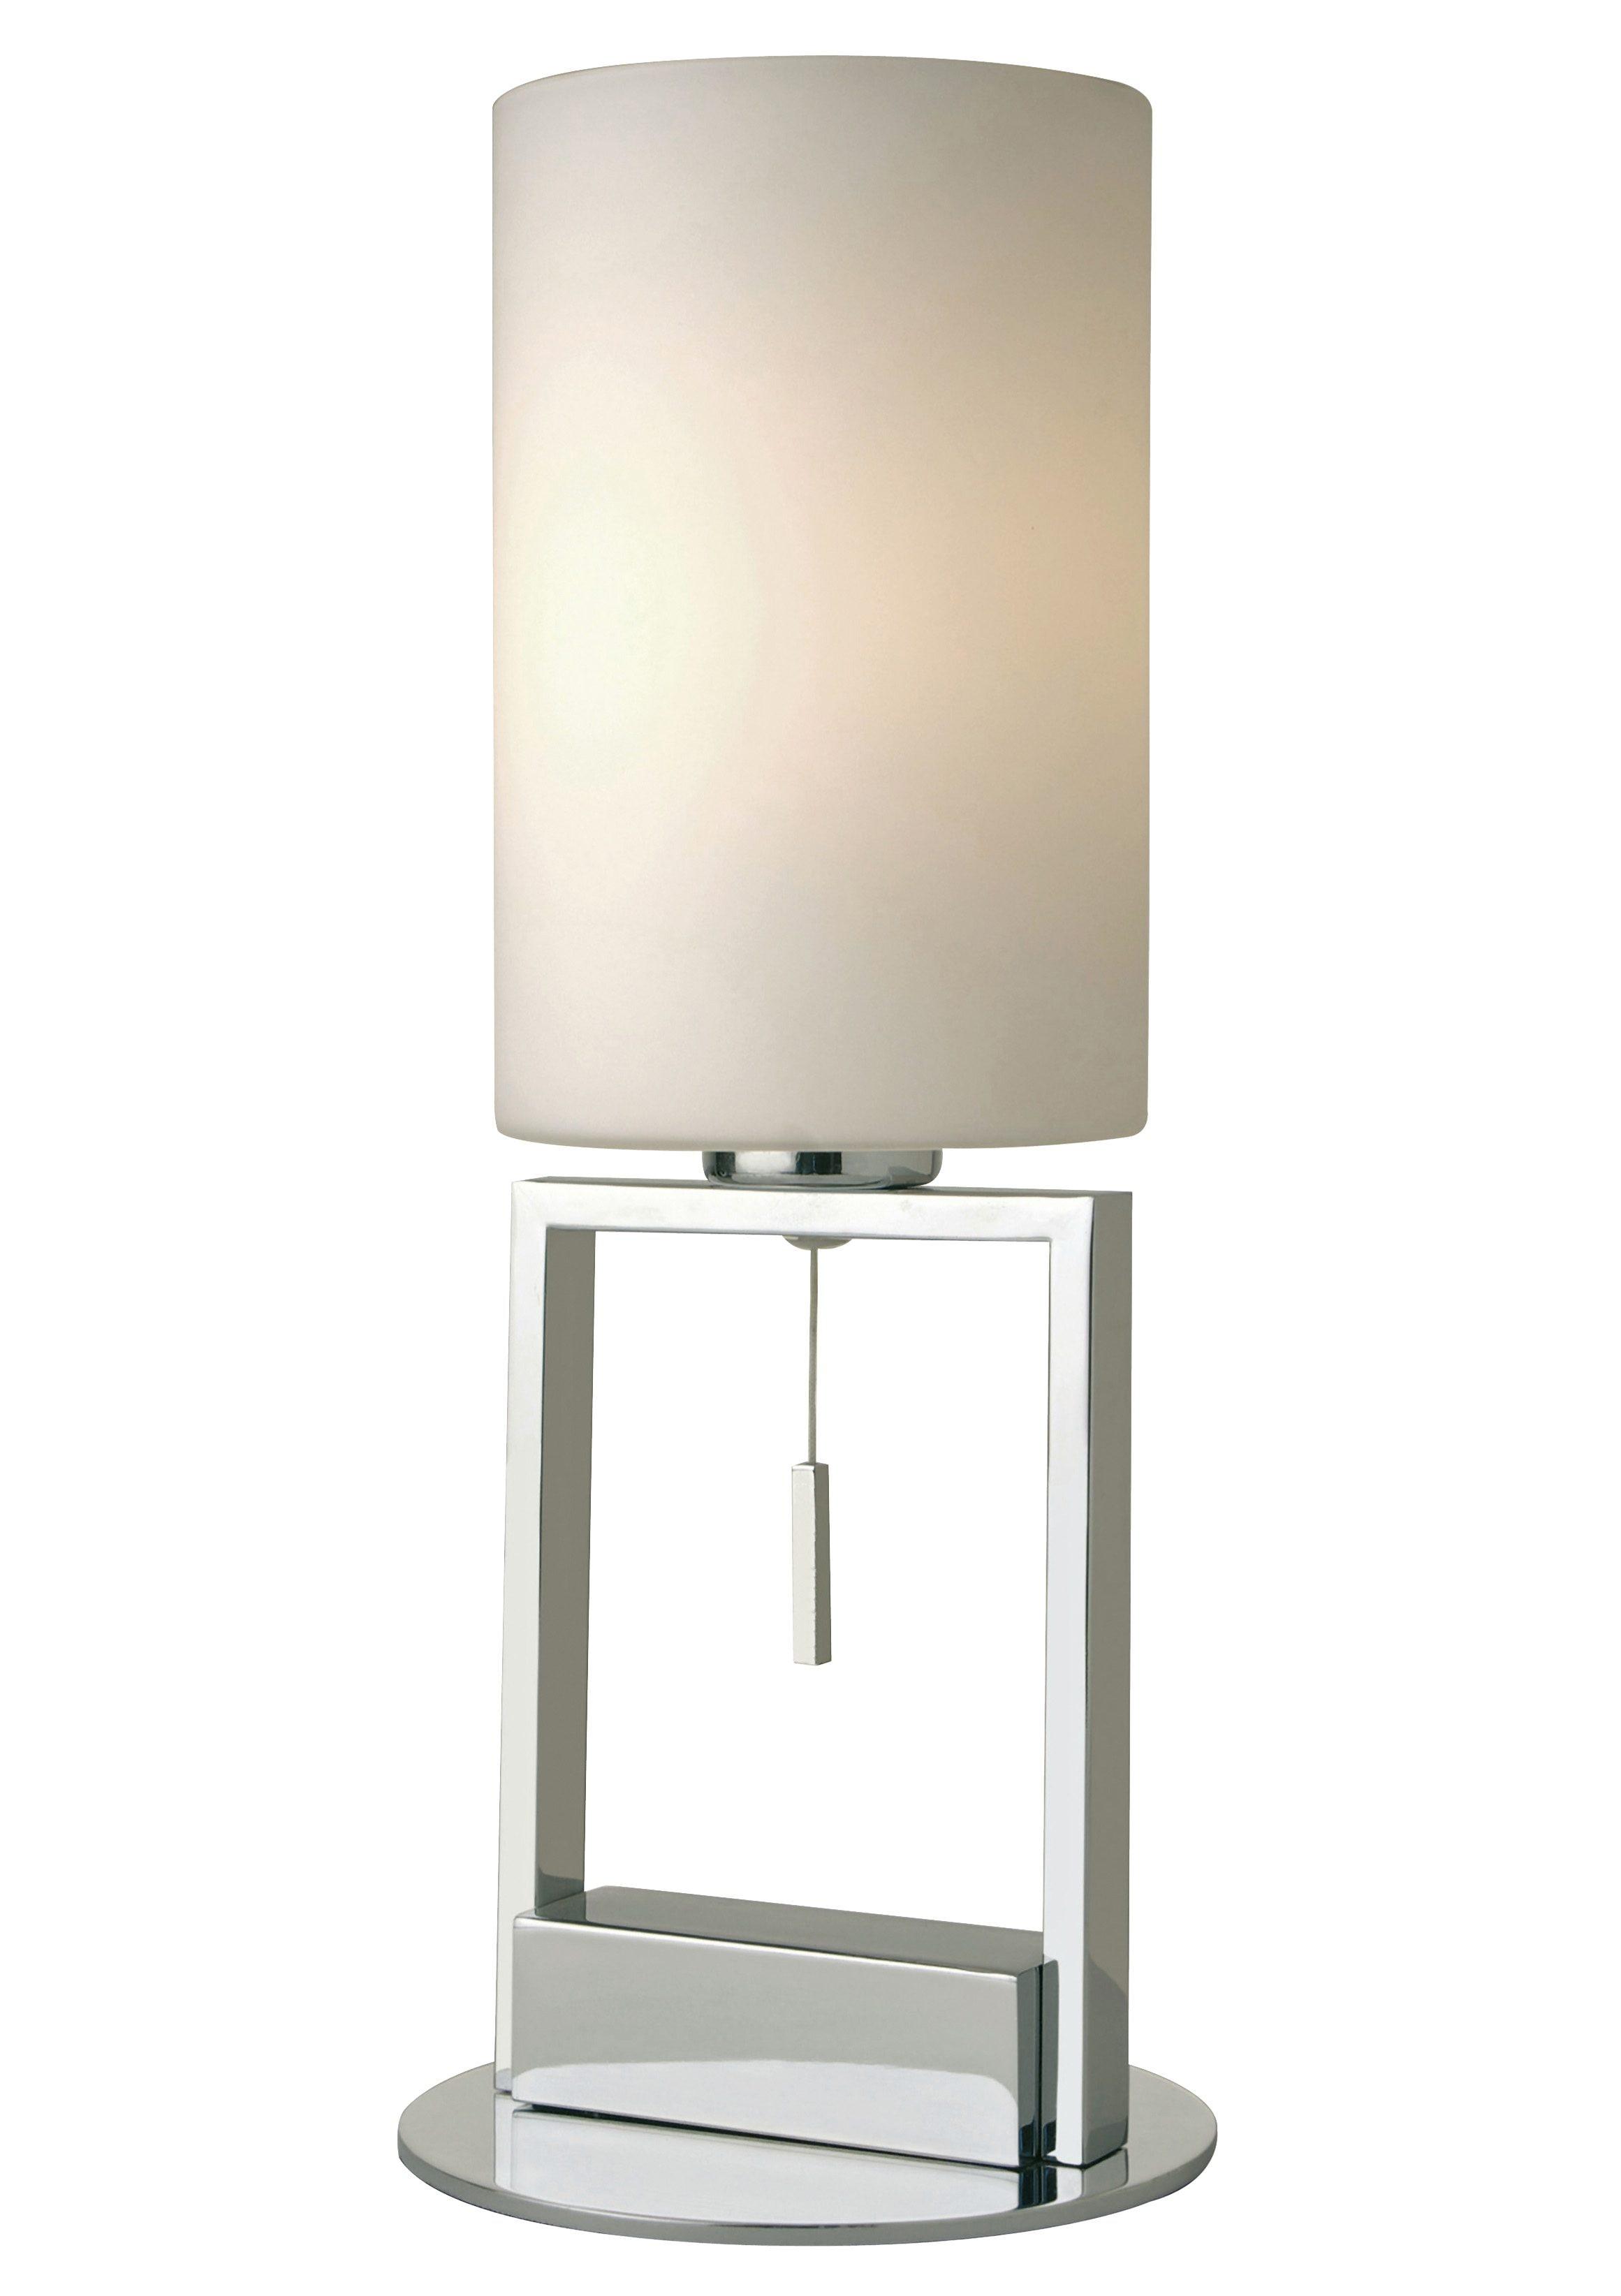 SOMPEX Tischleuchte, E27